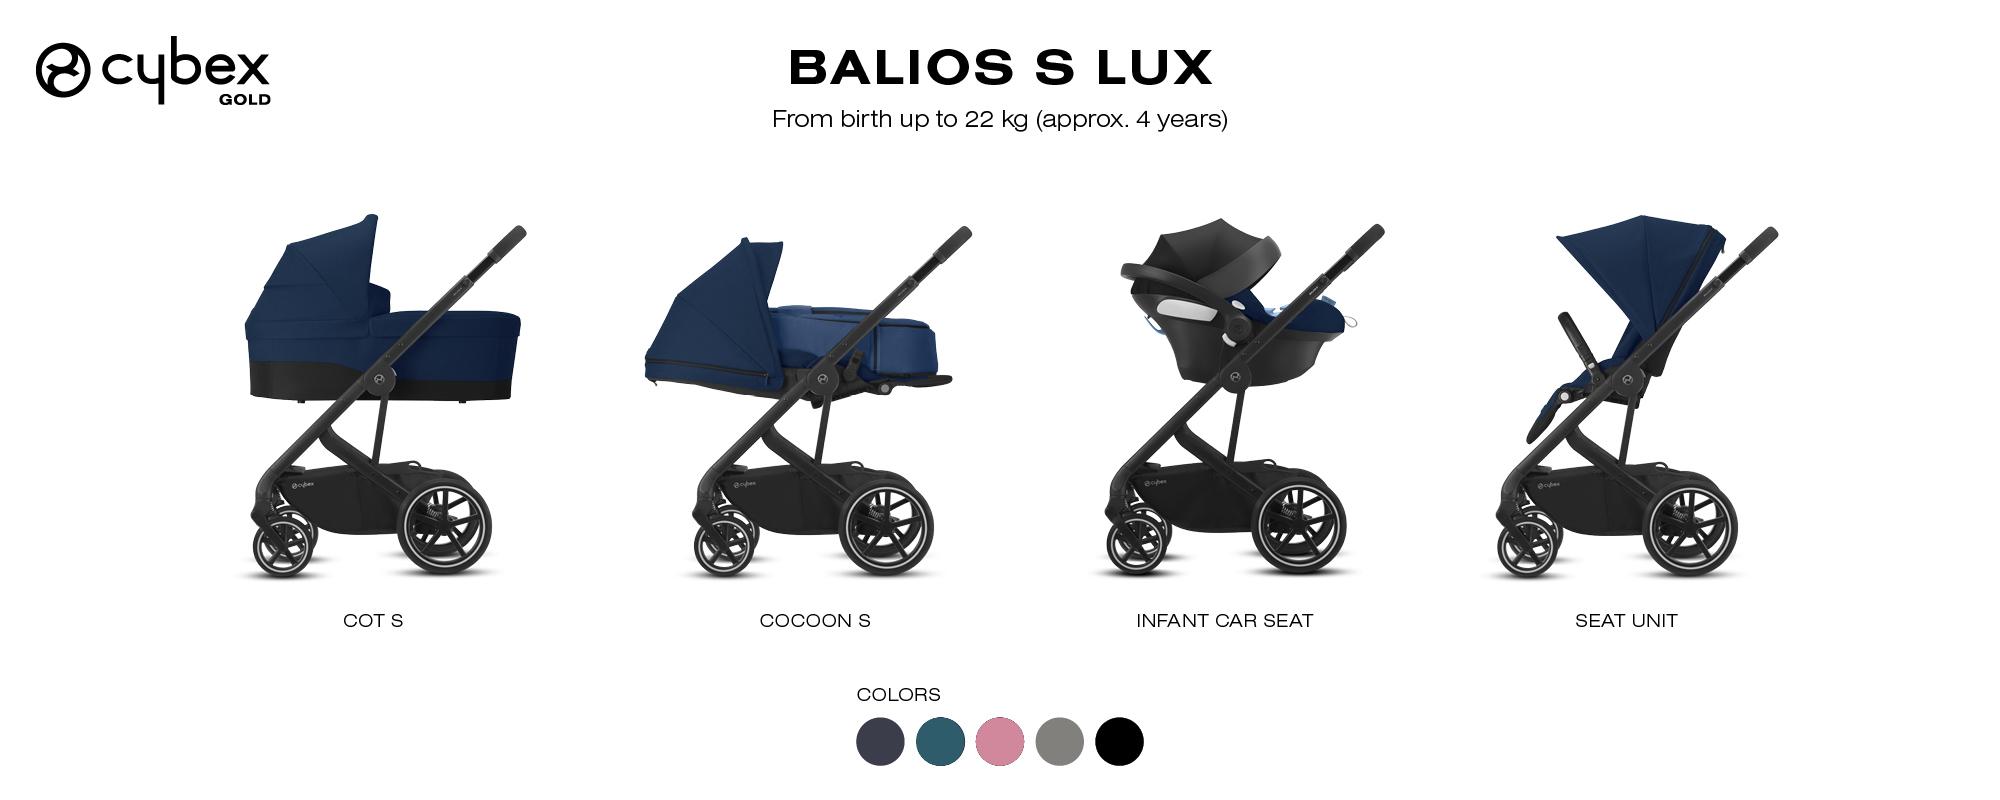 Balios S Lux